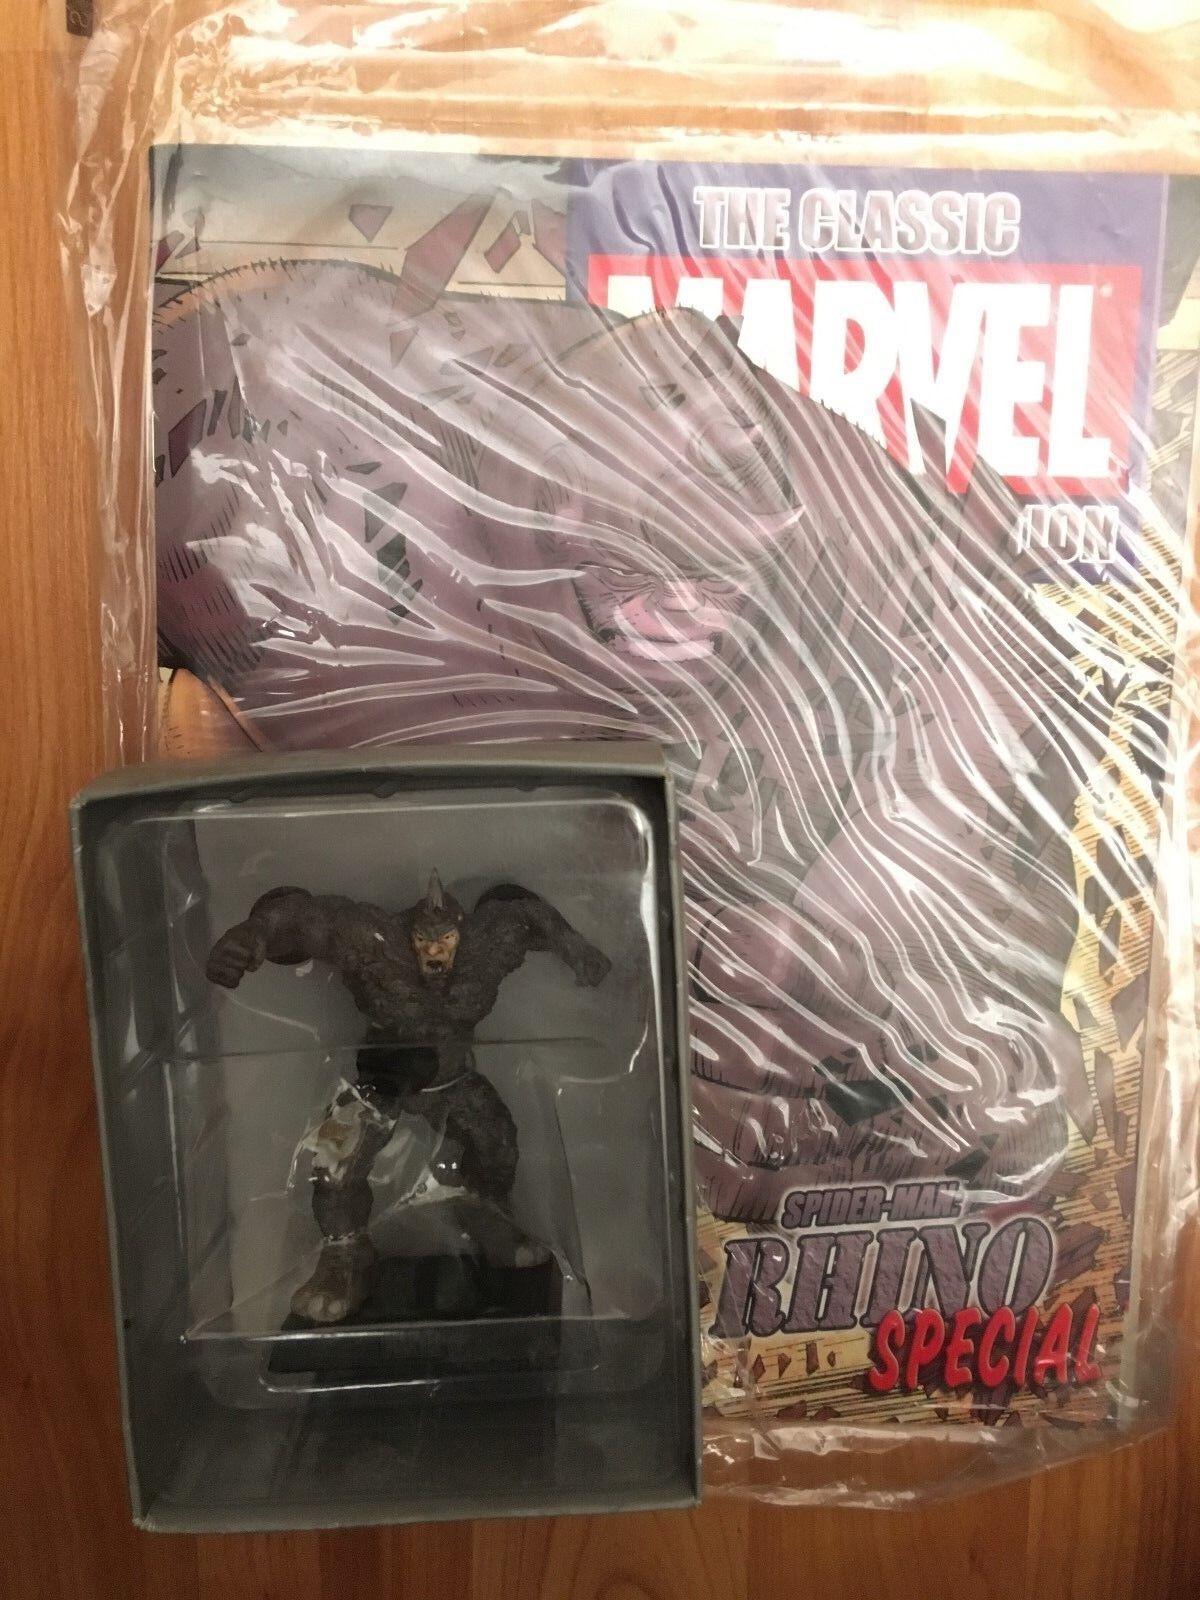 Marvel 'sammlung sonderausgabe nashorn eaglemoss abbildung + magazine